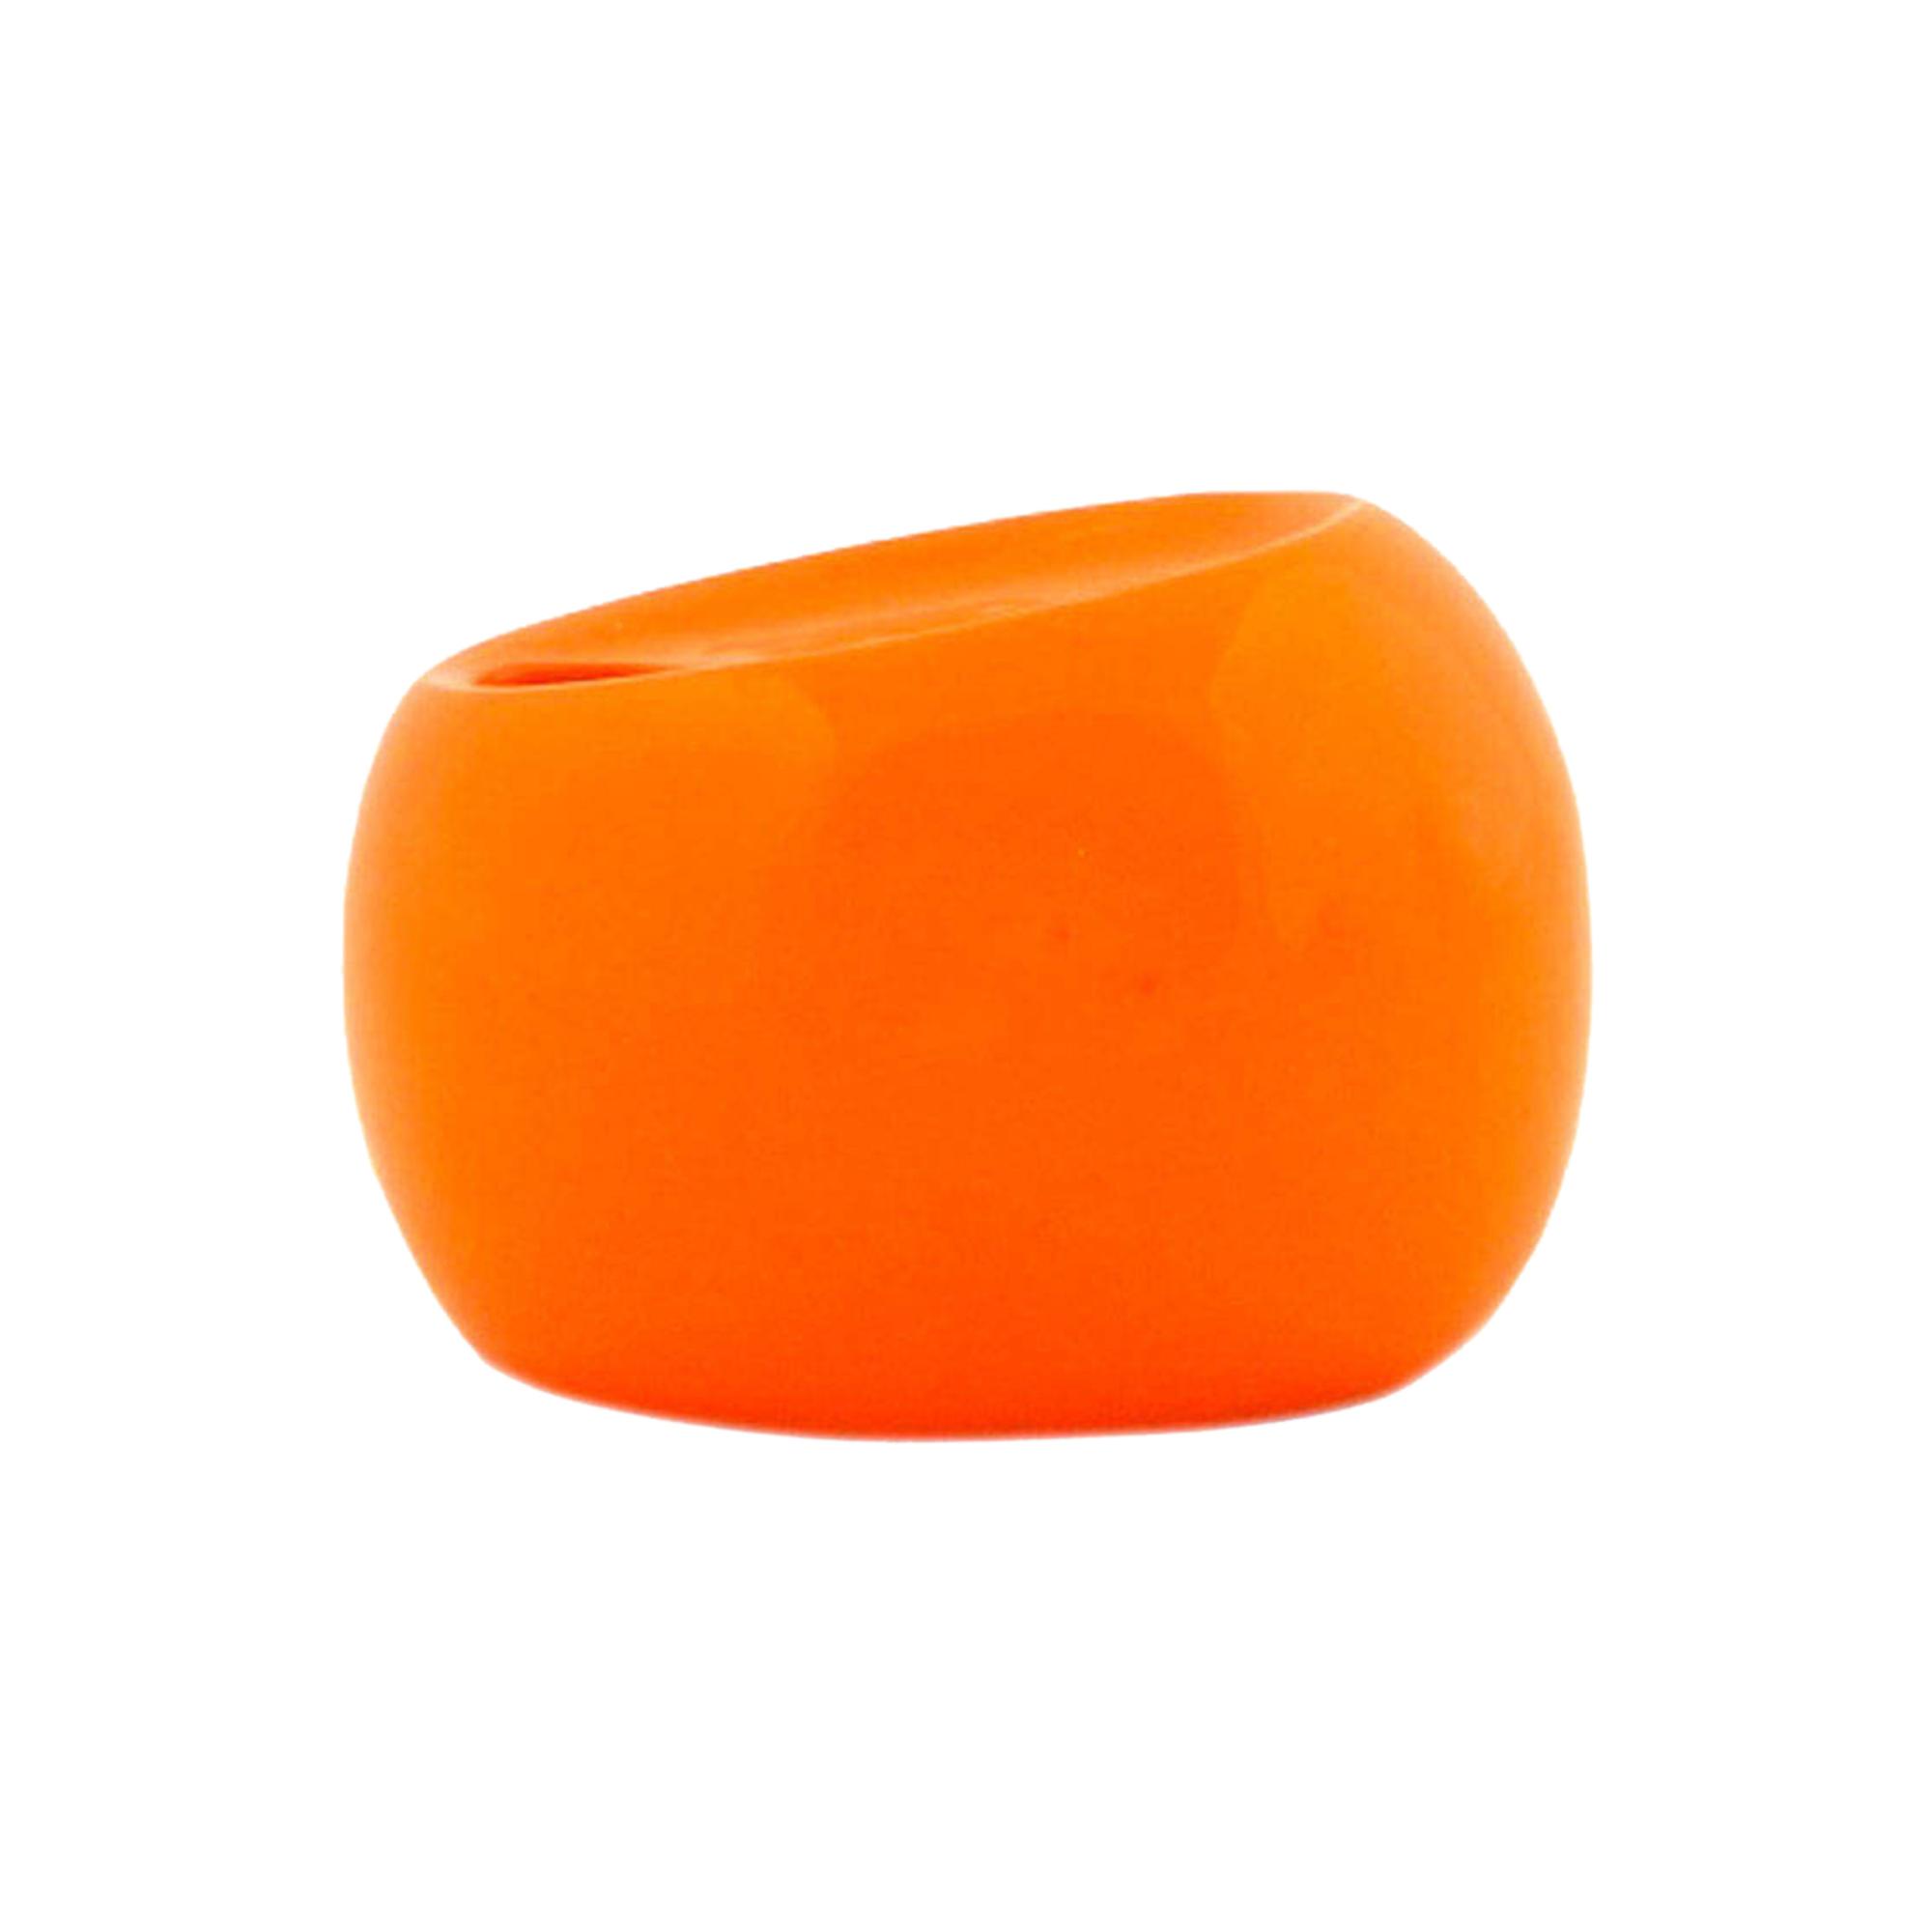 Фото - Стакан для зубных щёток Primanova Nora оранжевый 11х8х9 см стакан для зубных щёток primanova garden